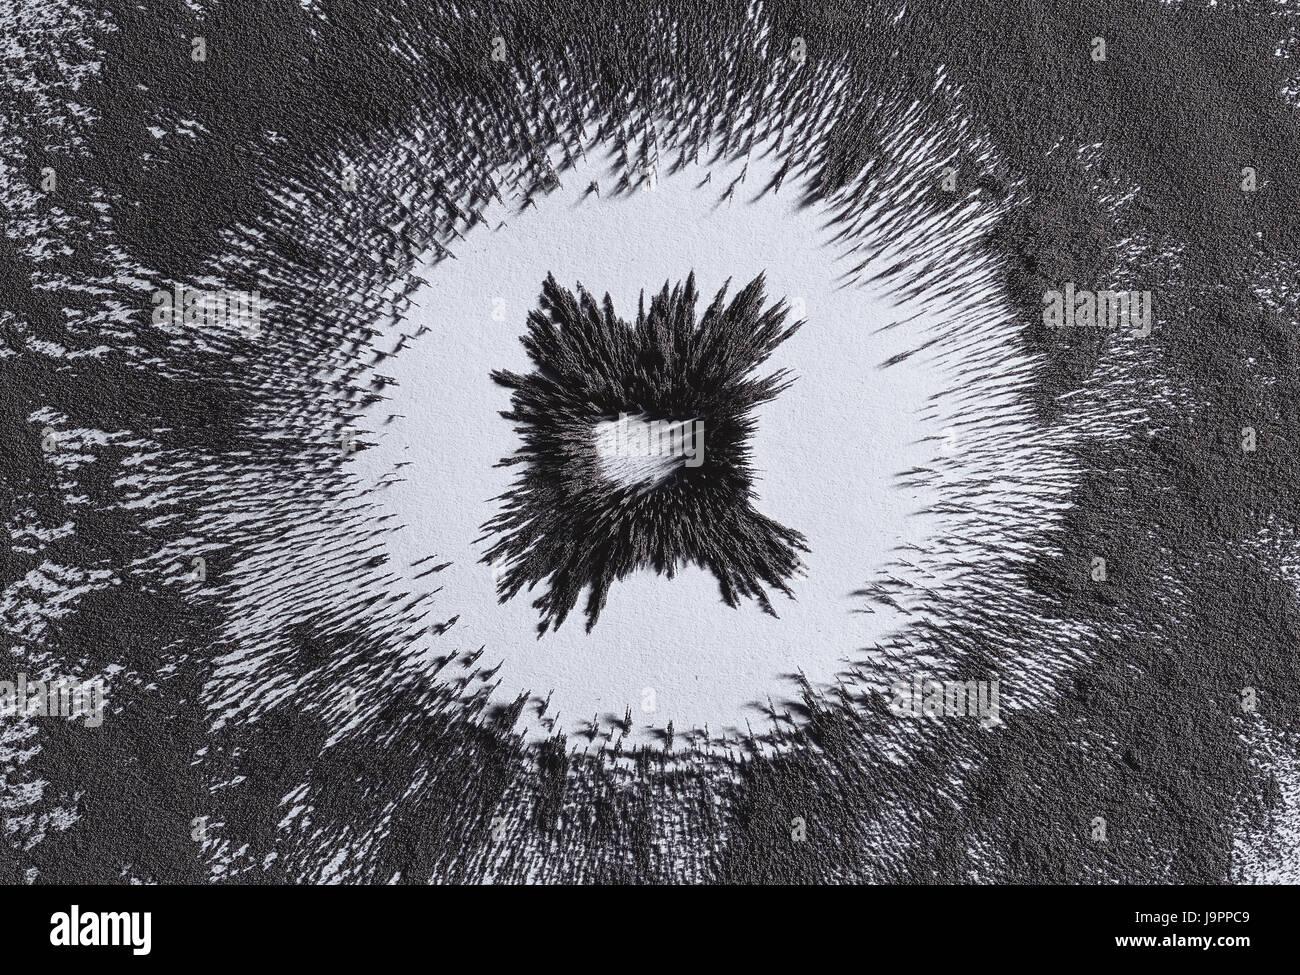 Magnetic Field Lines Stockfotos & Magnetic Field Lines Bilder - Alamy